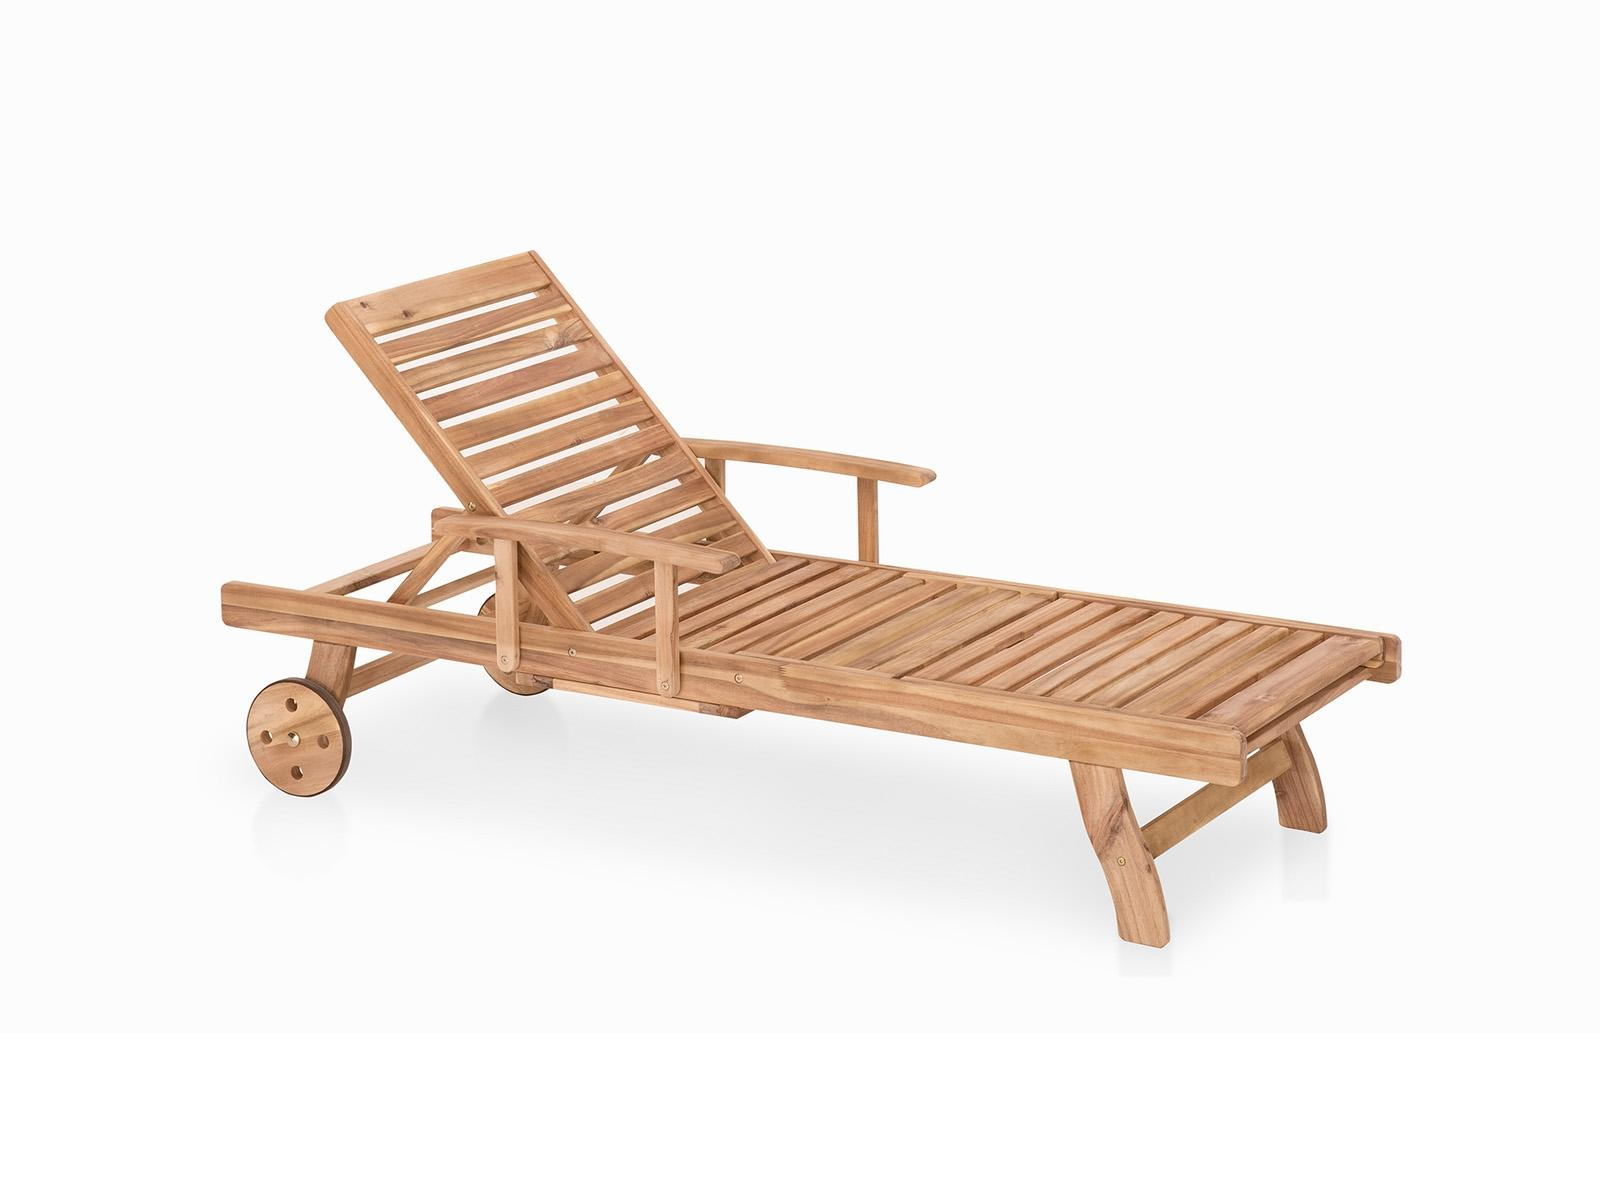 Meubles en bois teck Chaise longue de jardin BELIANI